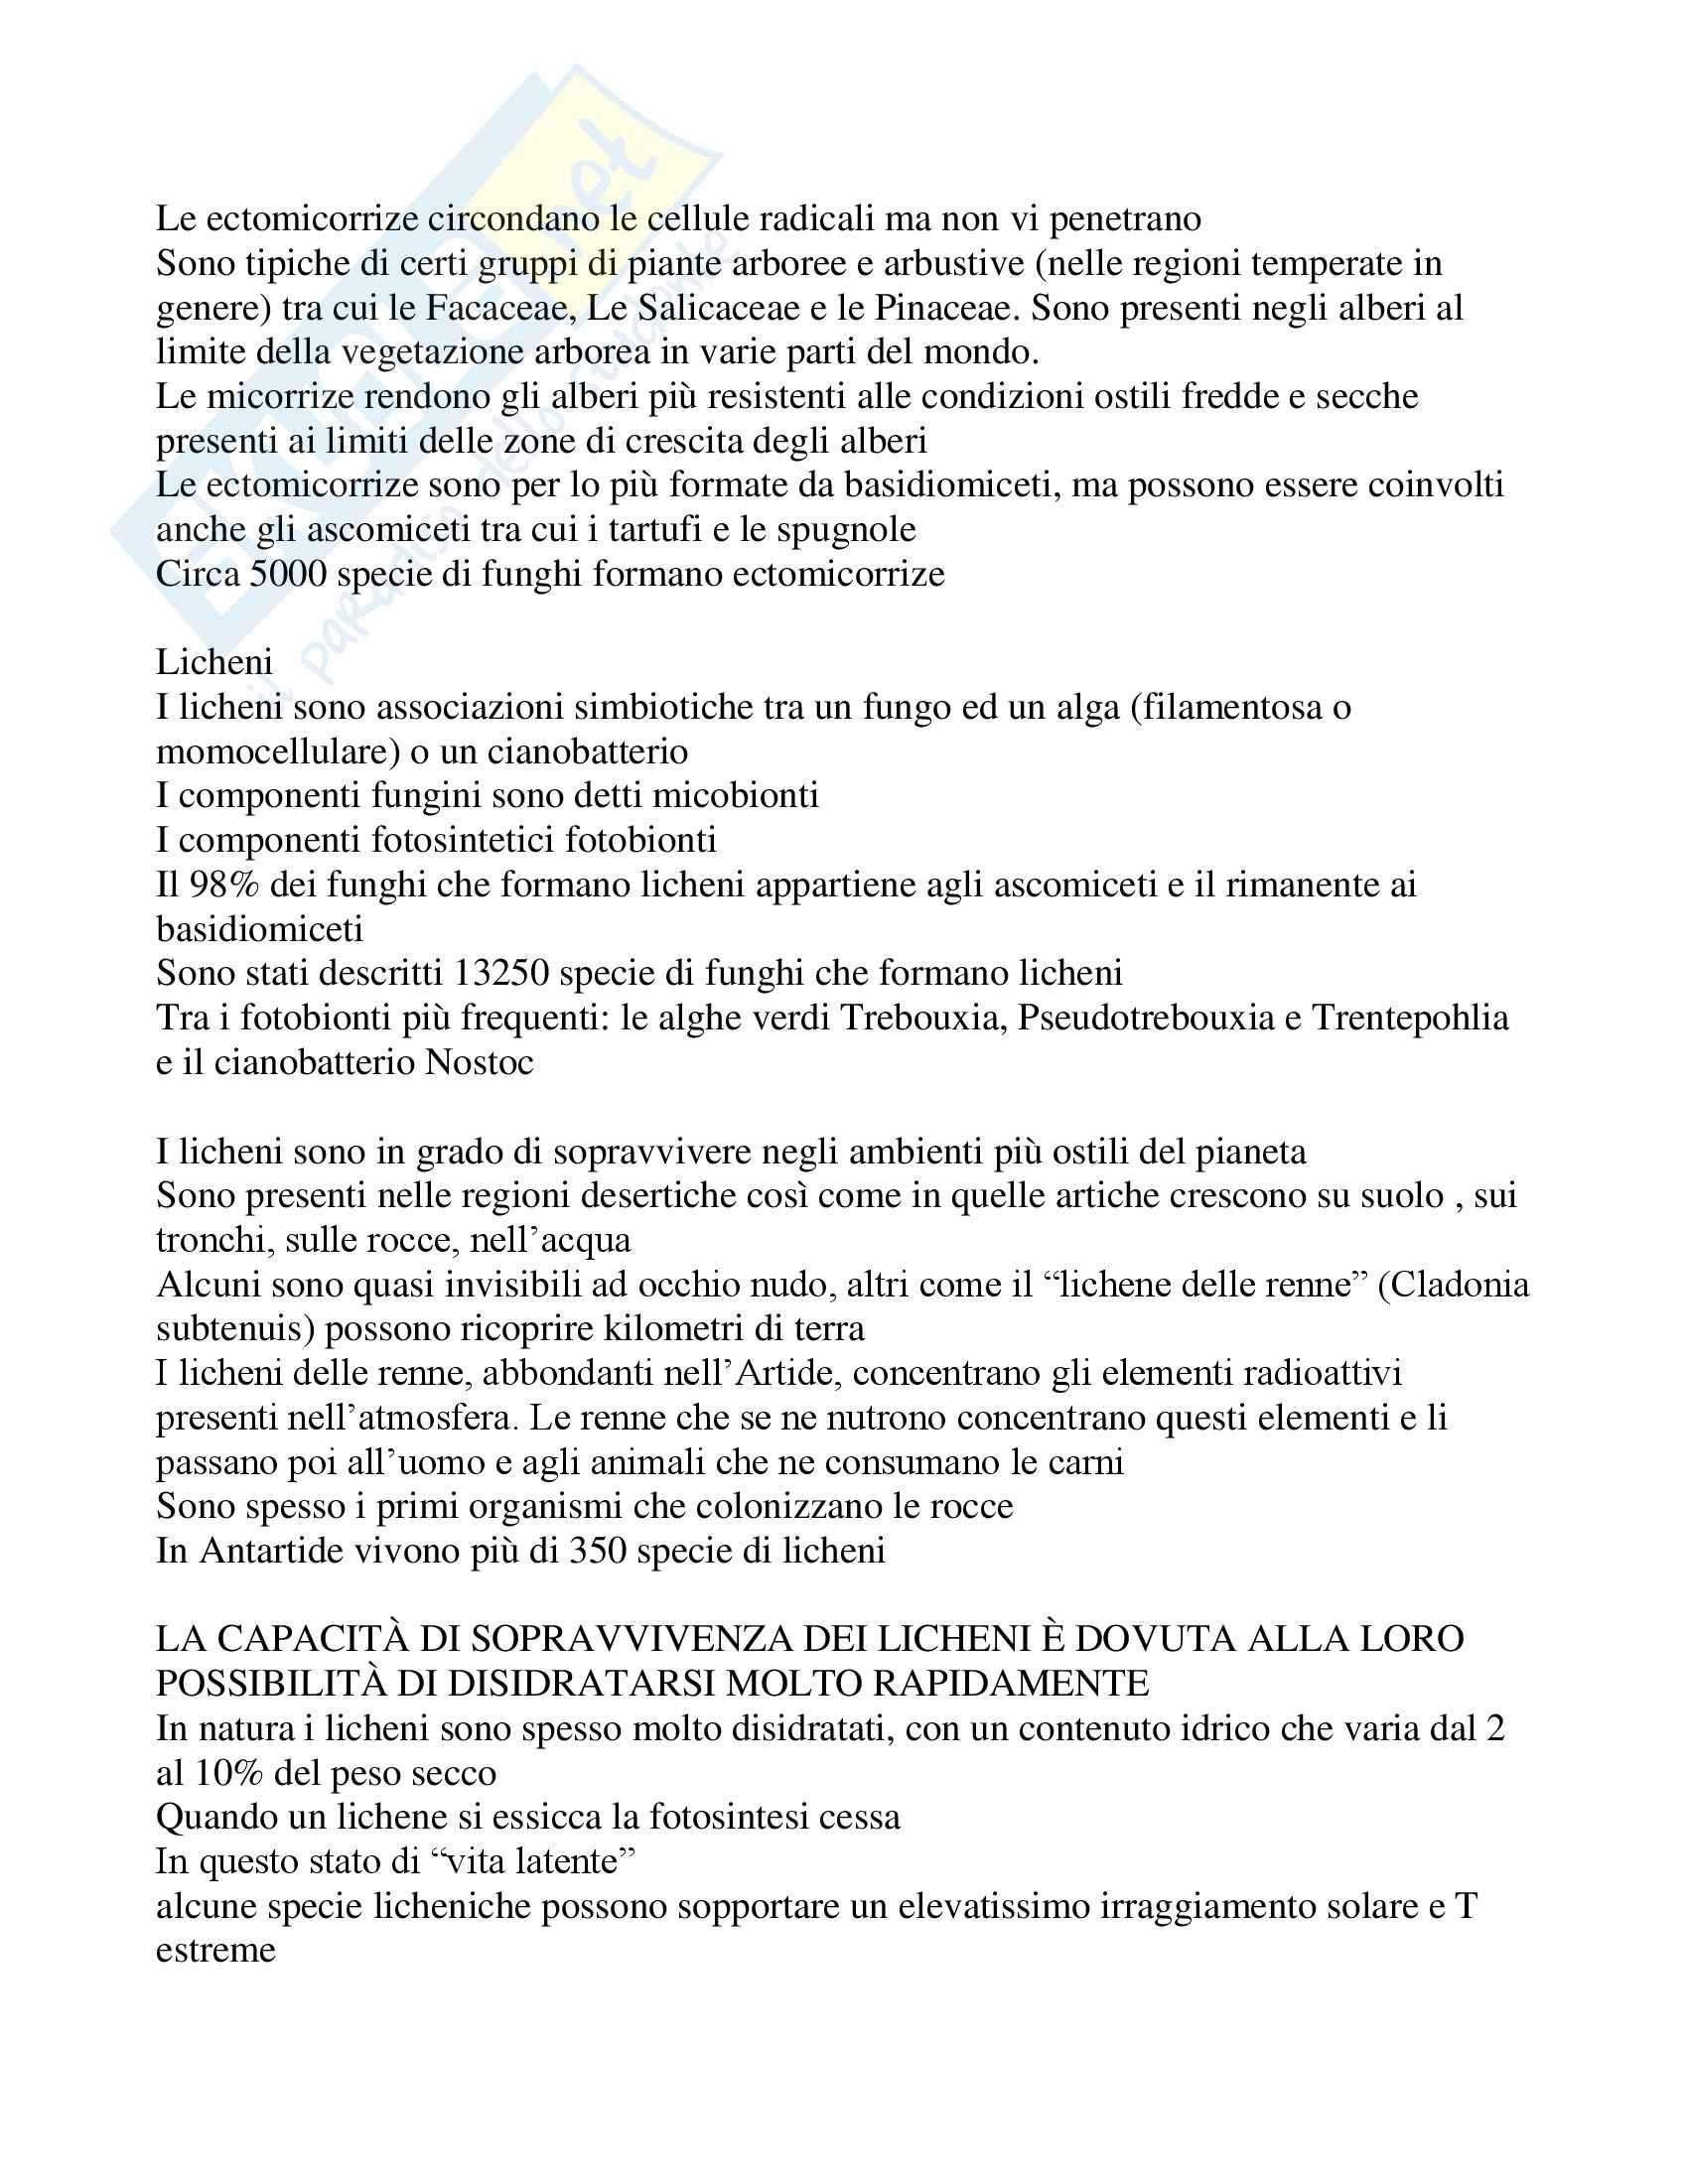 Biologia vegetale applicata - Appunti Pag. 21